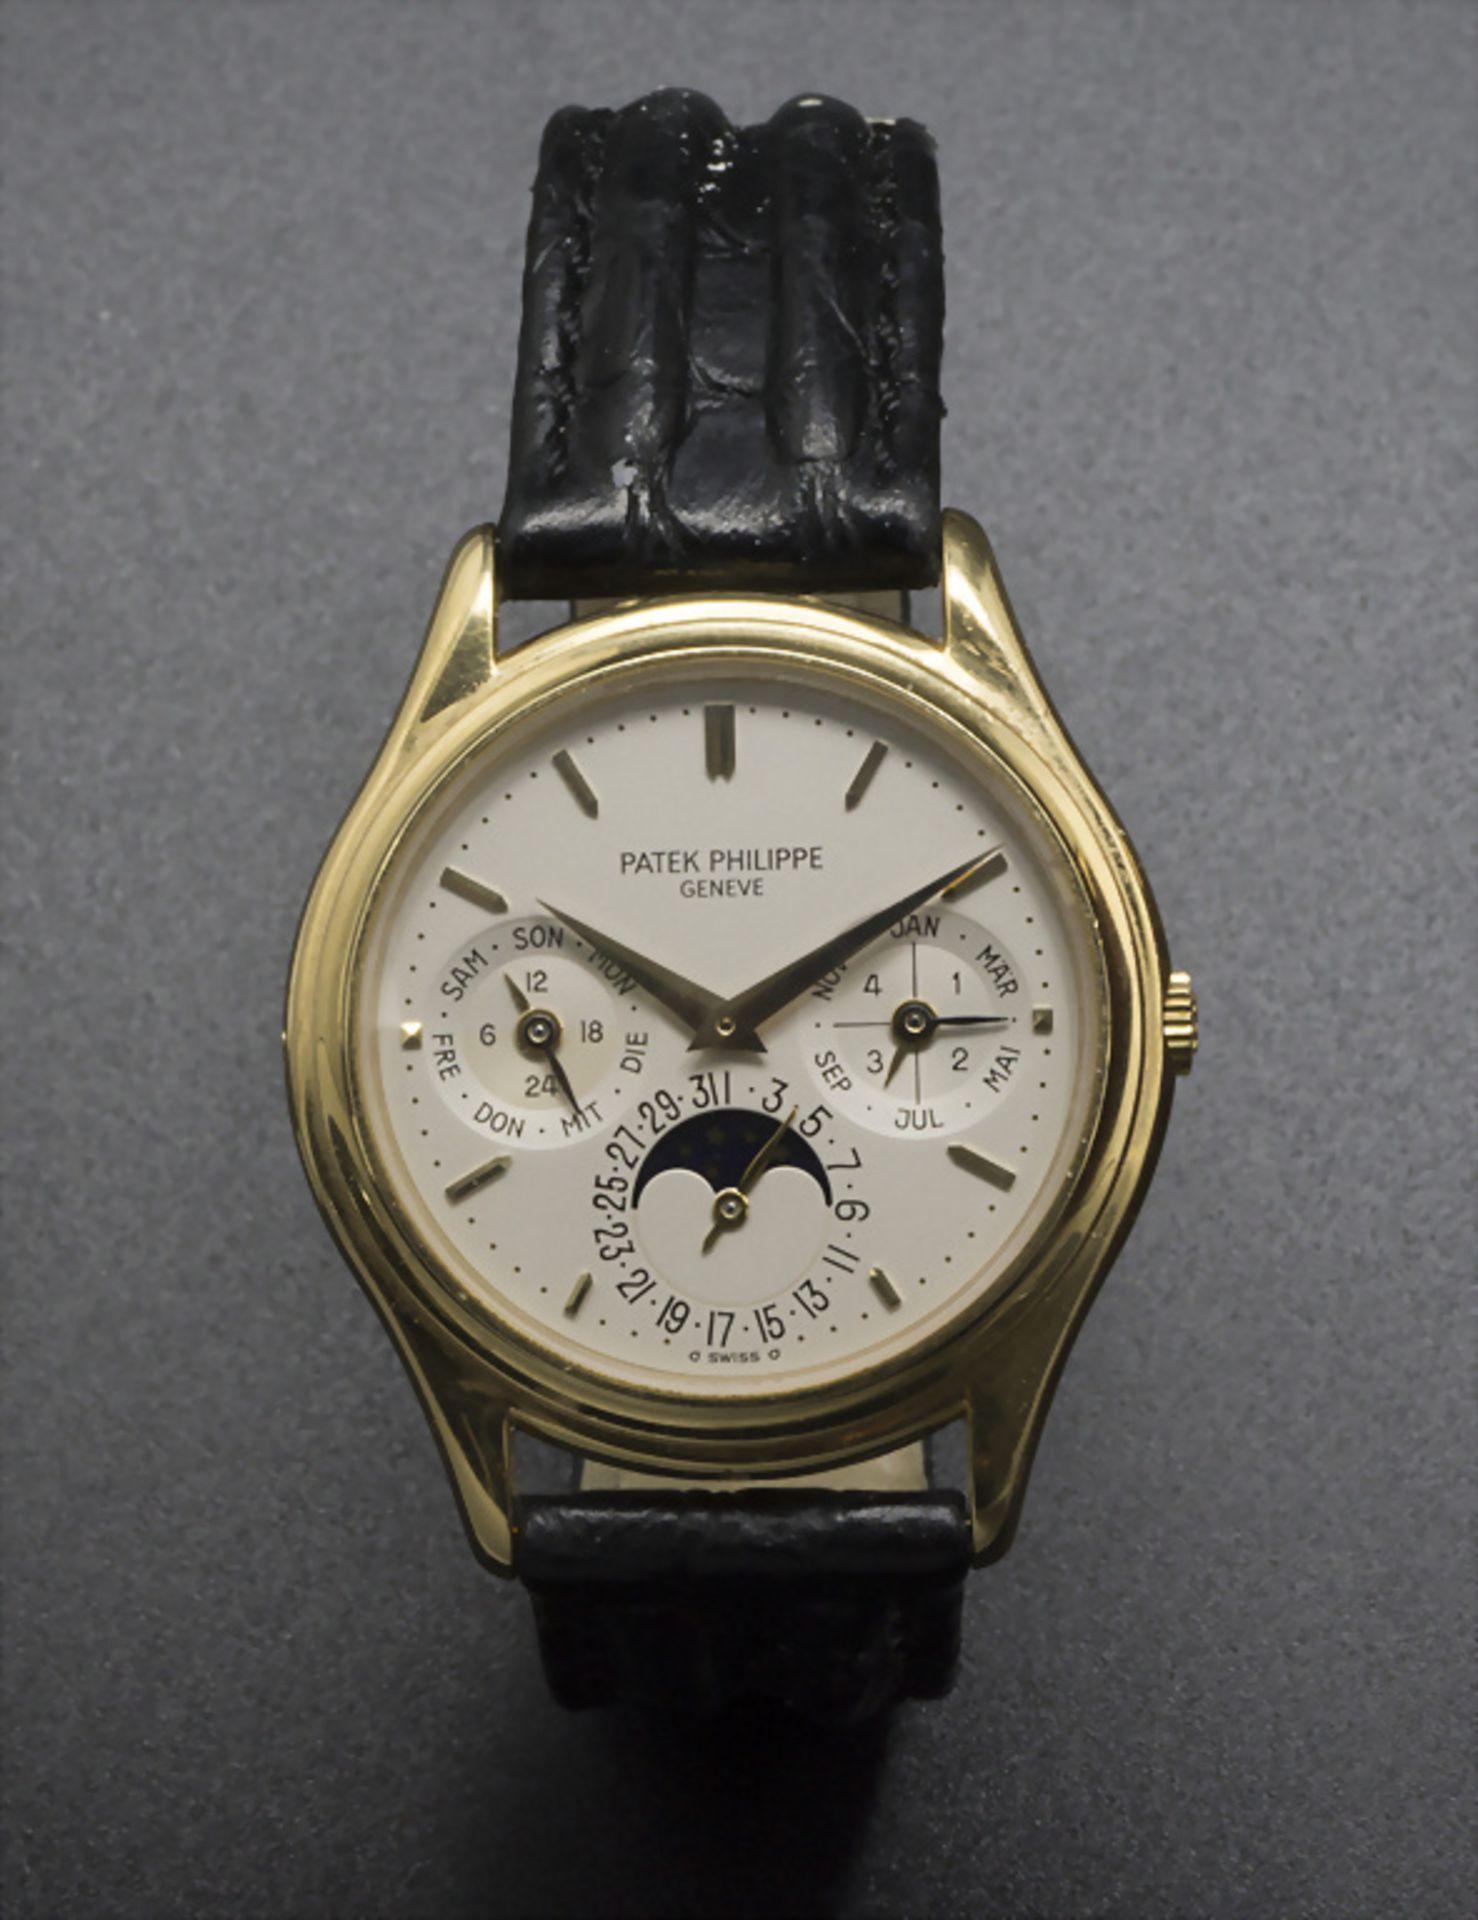 Armbanduhr, Automatik mit ewigem Kalender / A men's automatic wristwatch with perpetual ... - Image 2 of 7